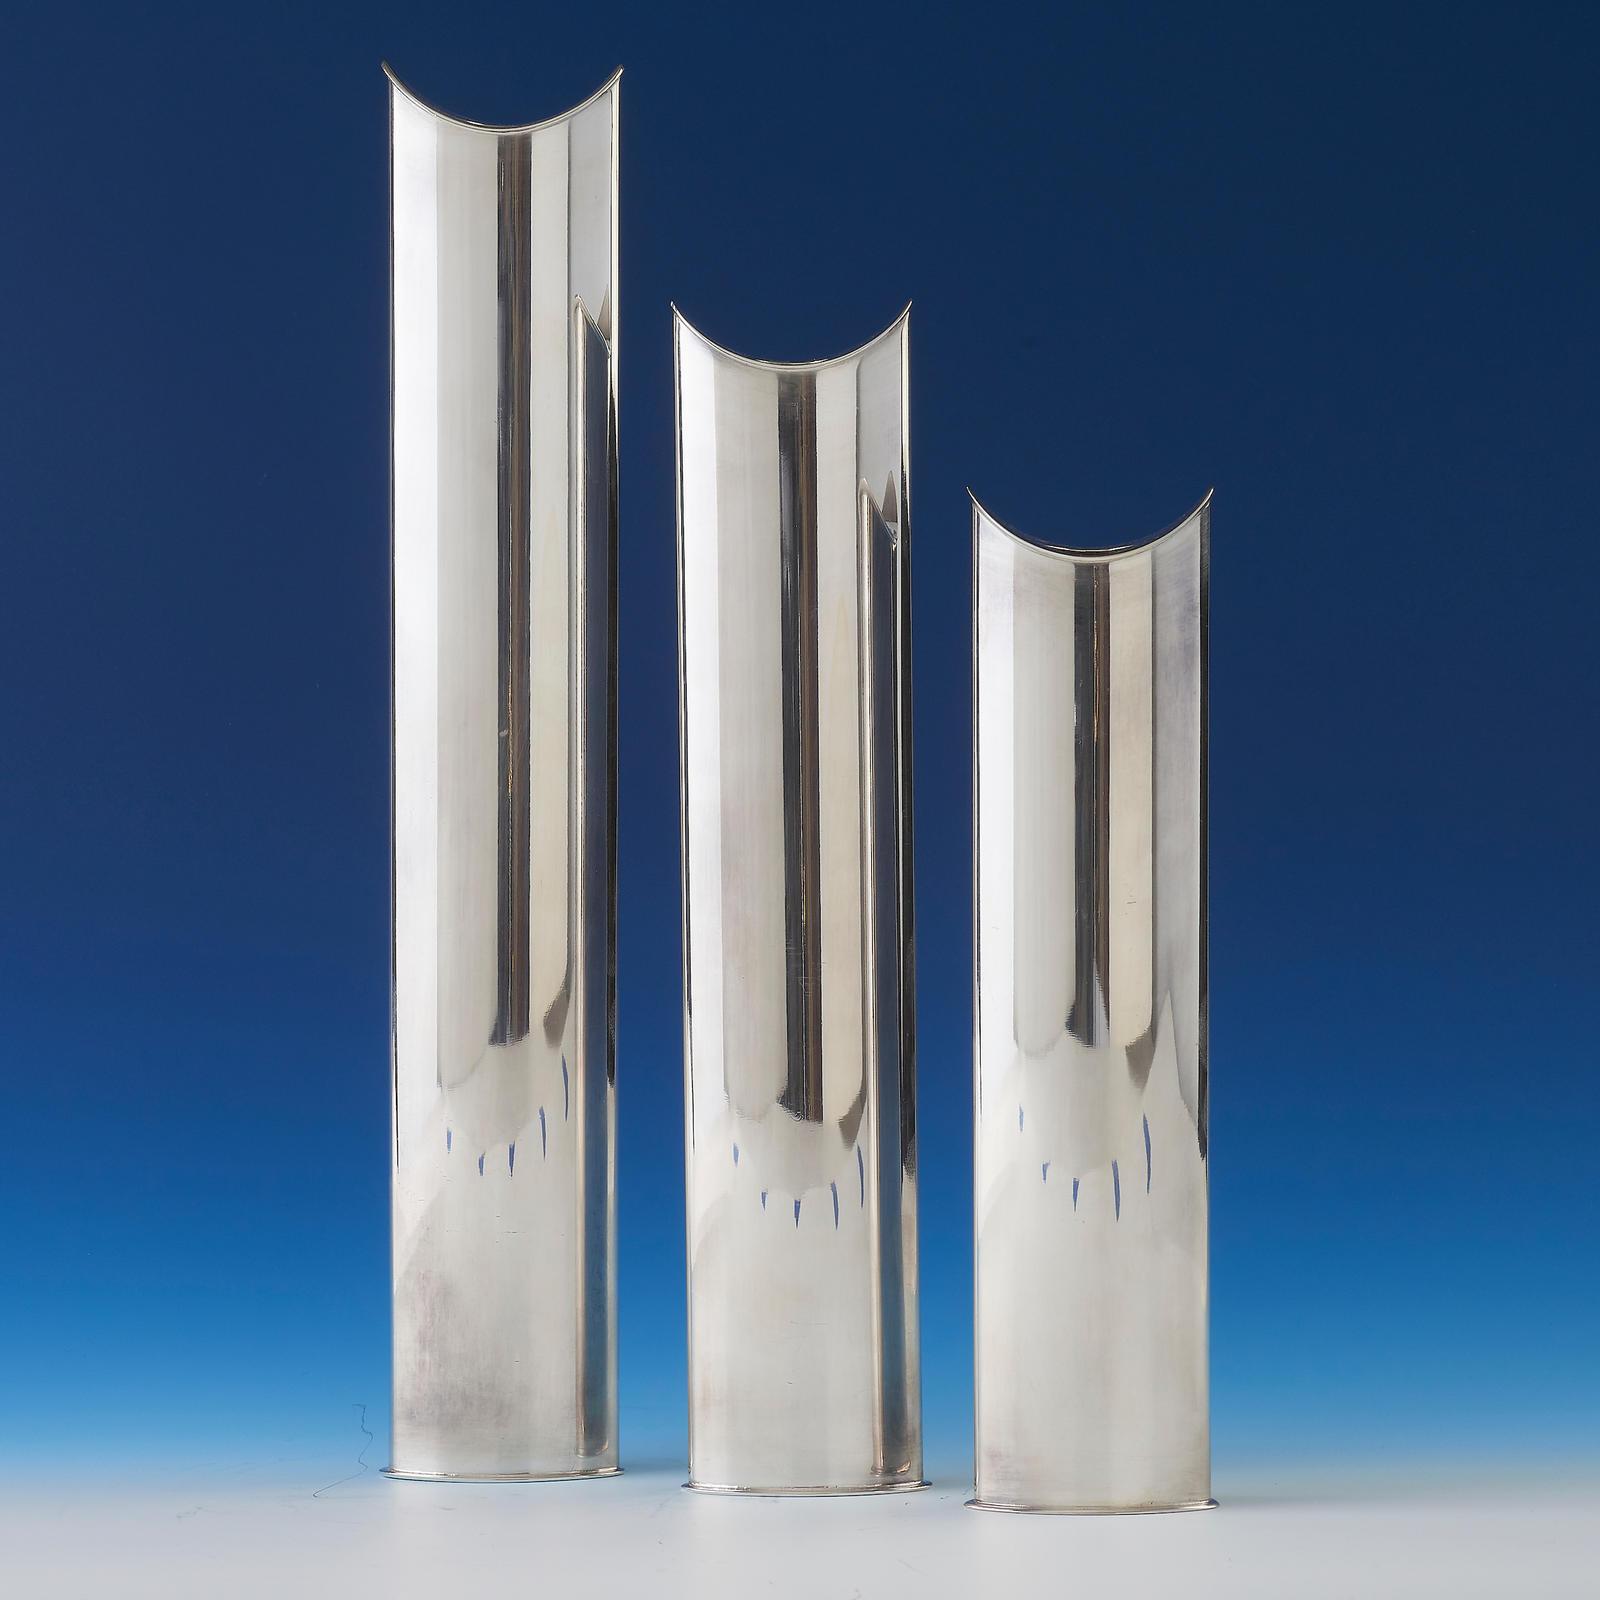 Mid Century Modern Set Of Ldquo Gie Rdquo Candlesticks